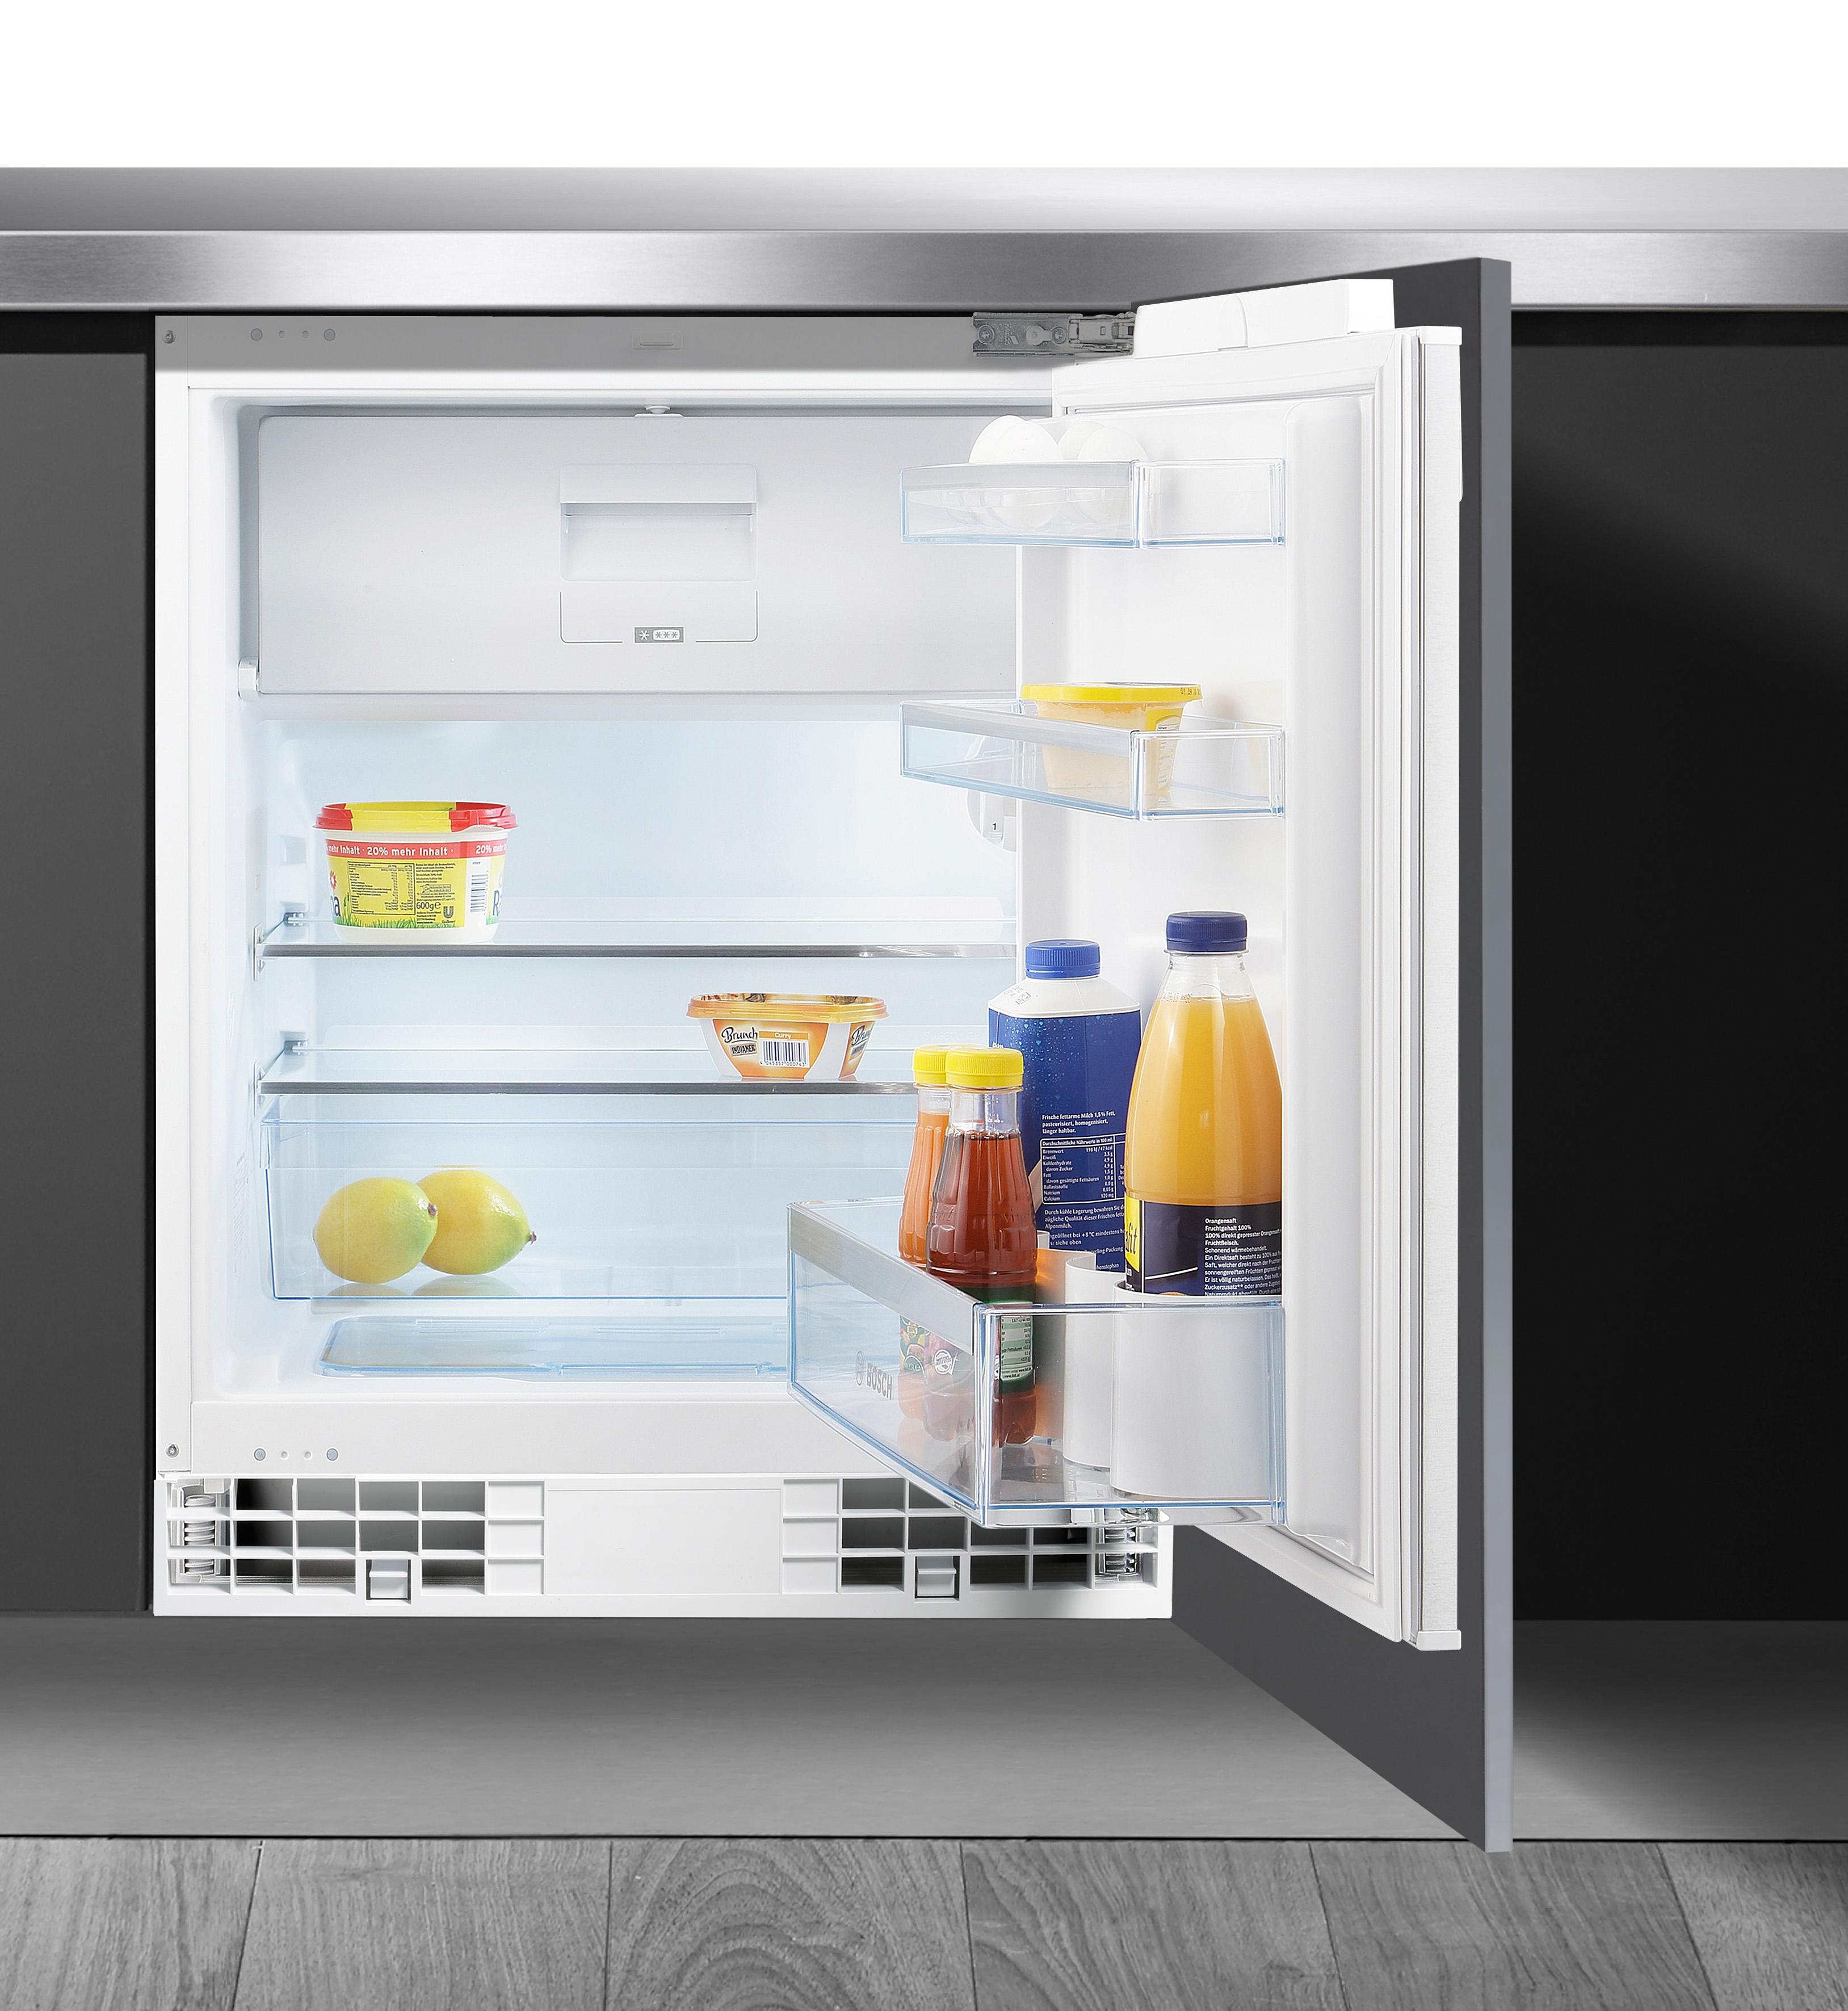 Bosch integreerbare onderbouwkoelkast KUL15A60, A++ nu online bestellen